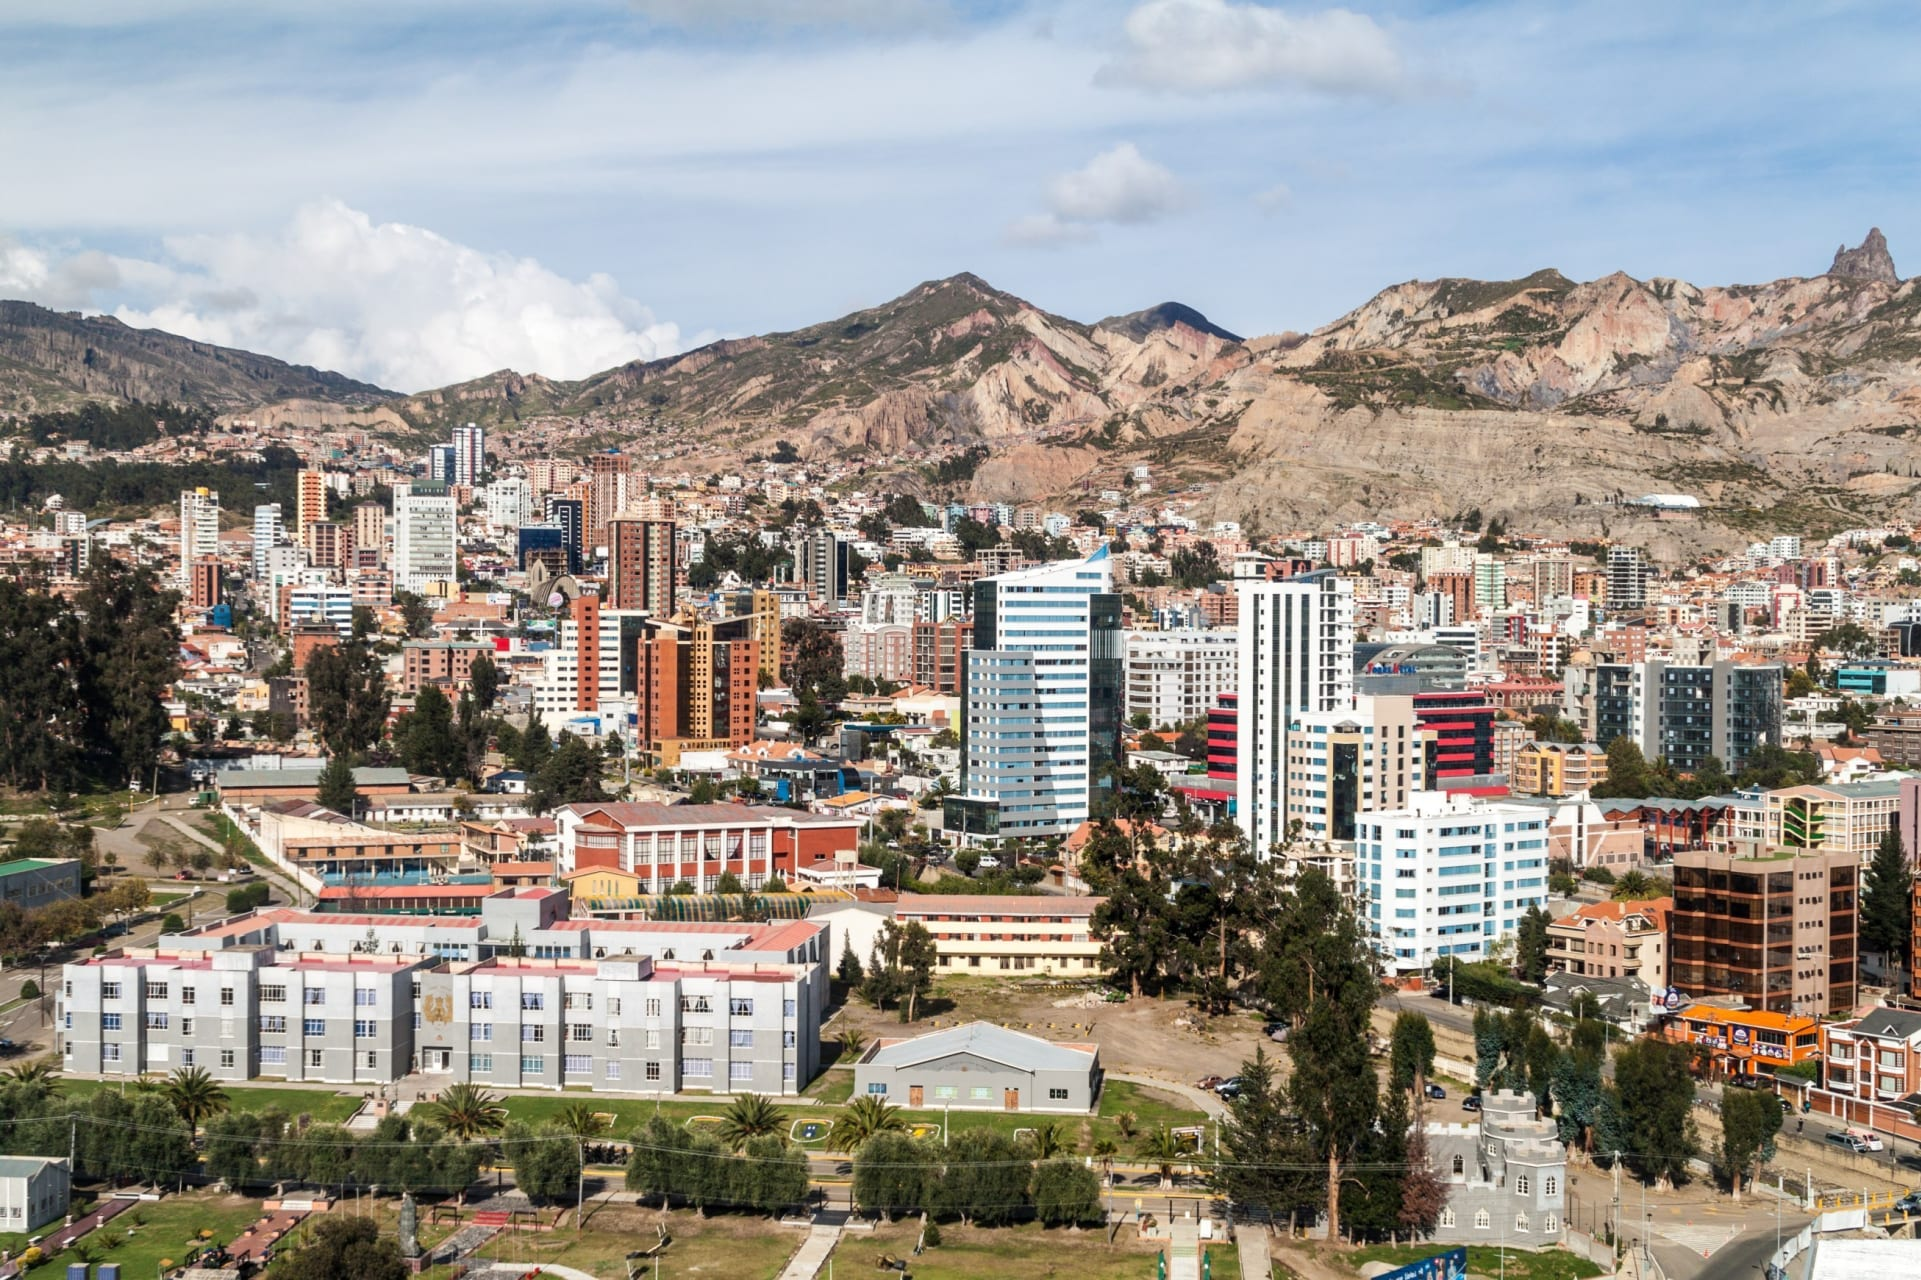 La Paz - Southern Zone: Residential Area